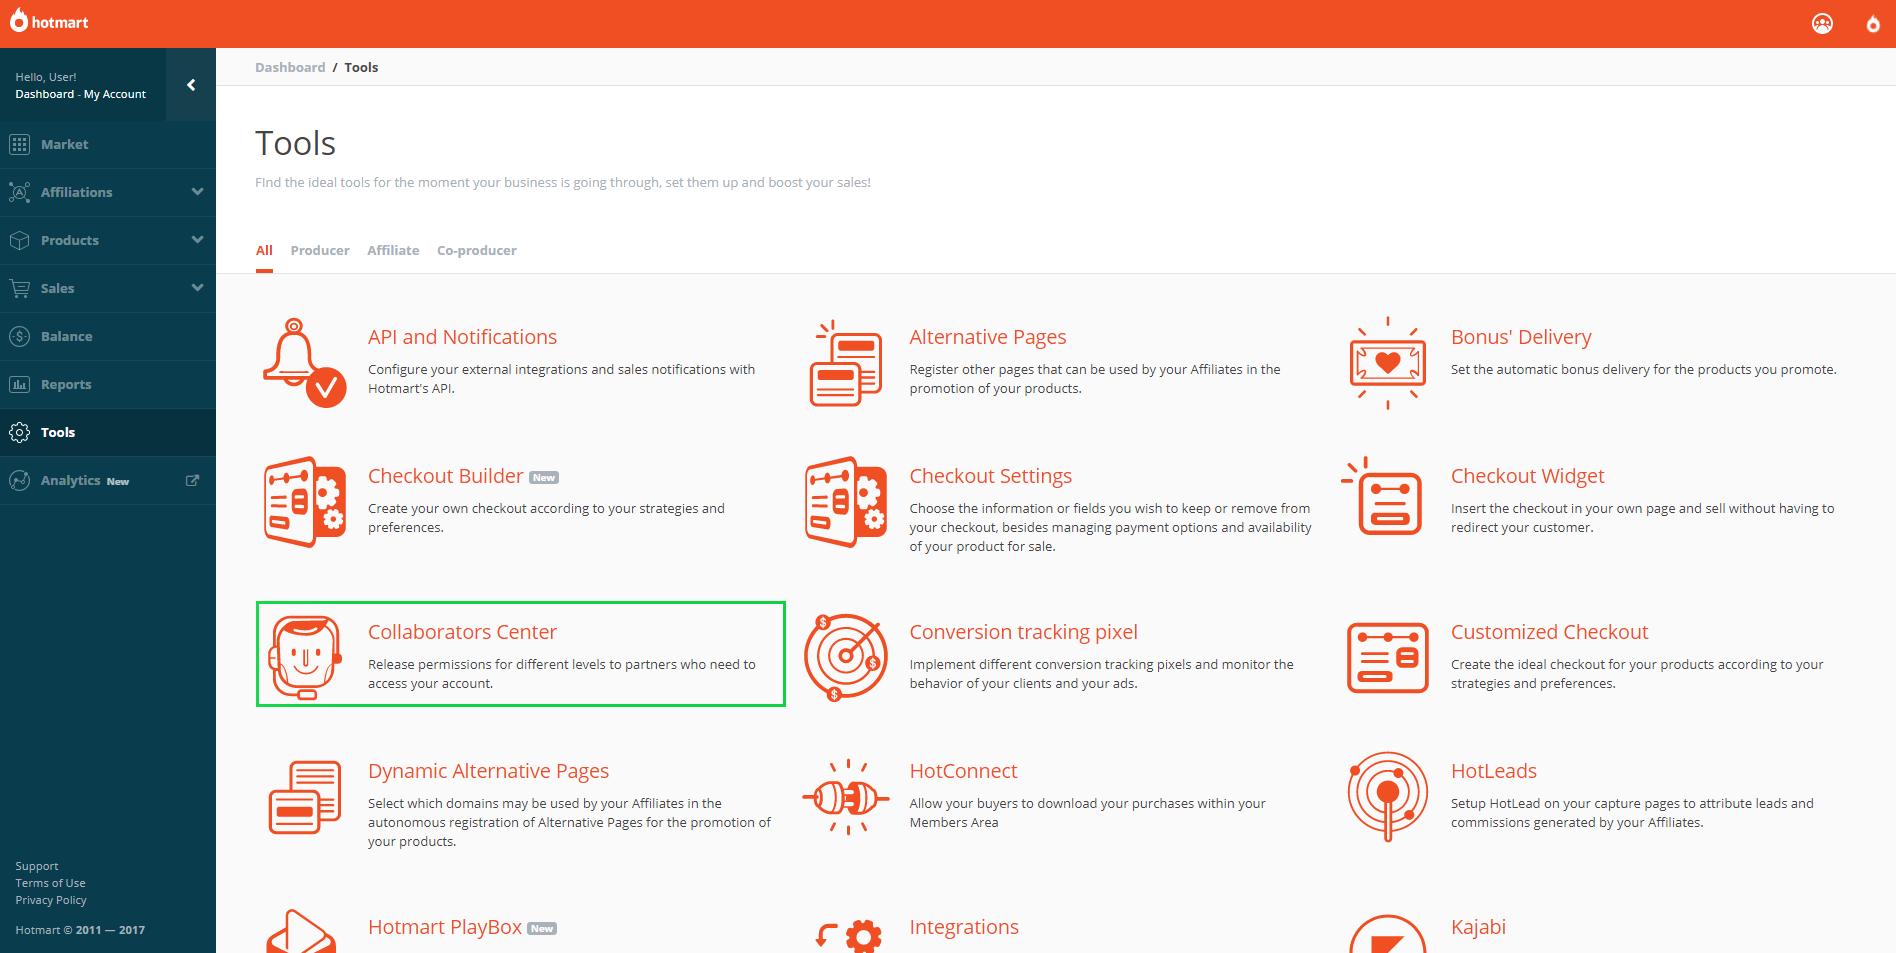 Print of the Hotmart platform in tools option